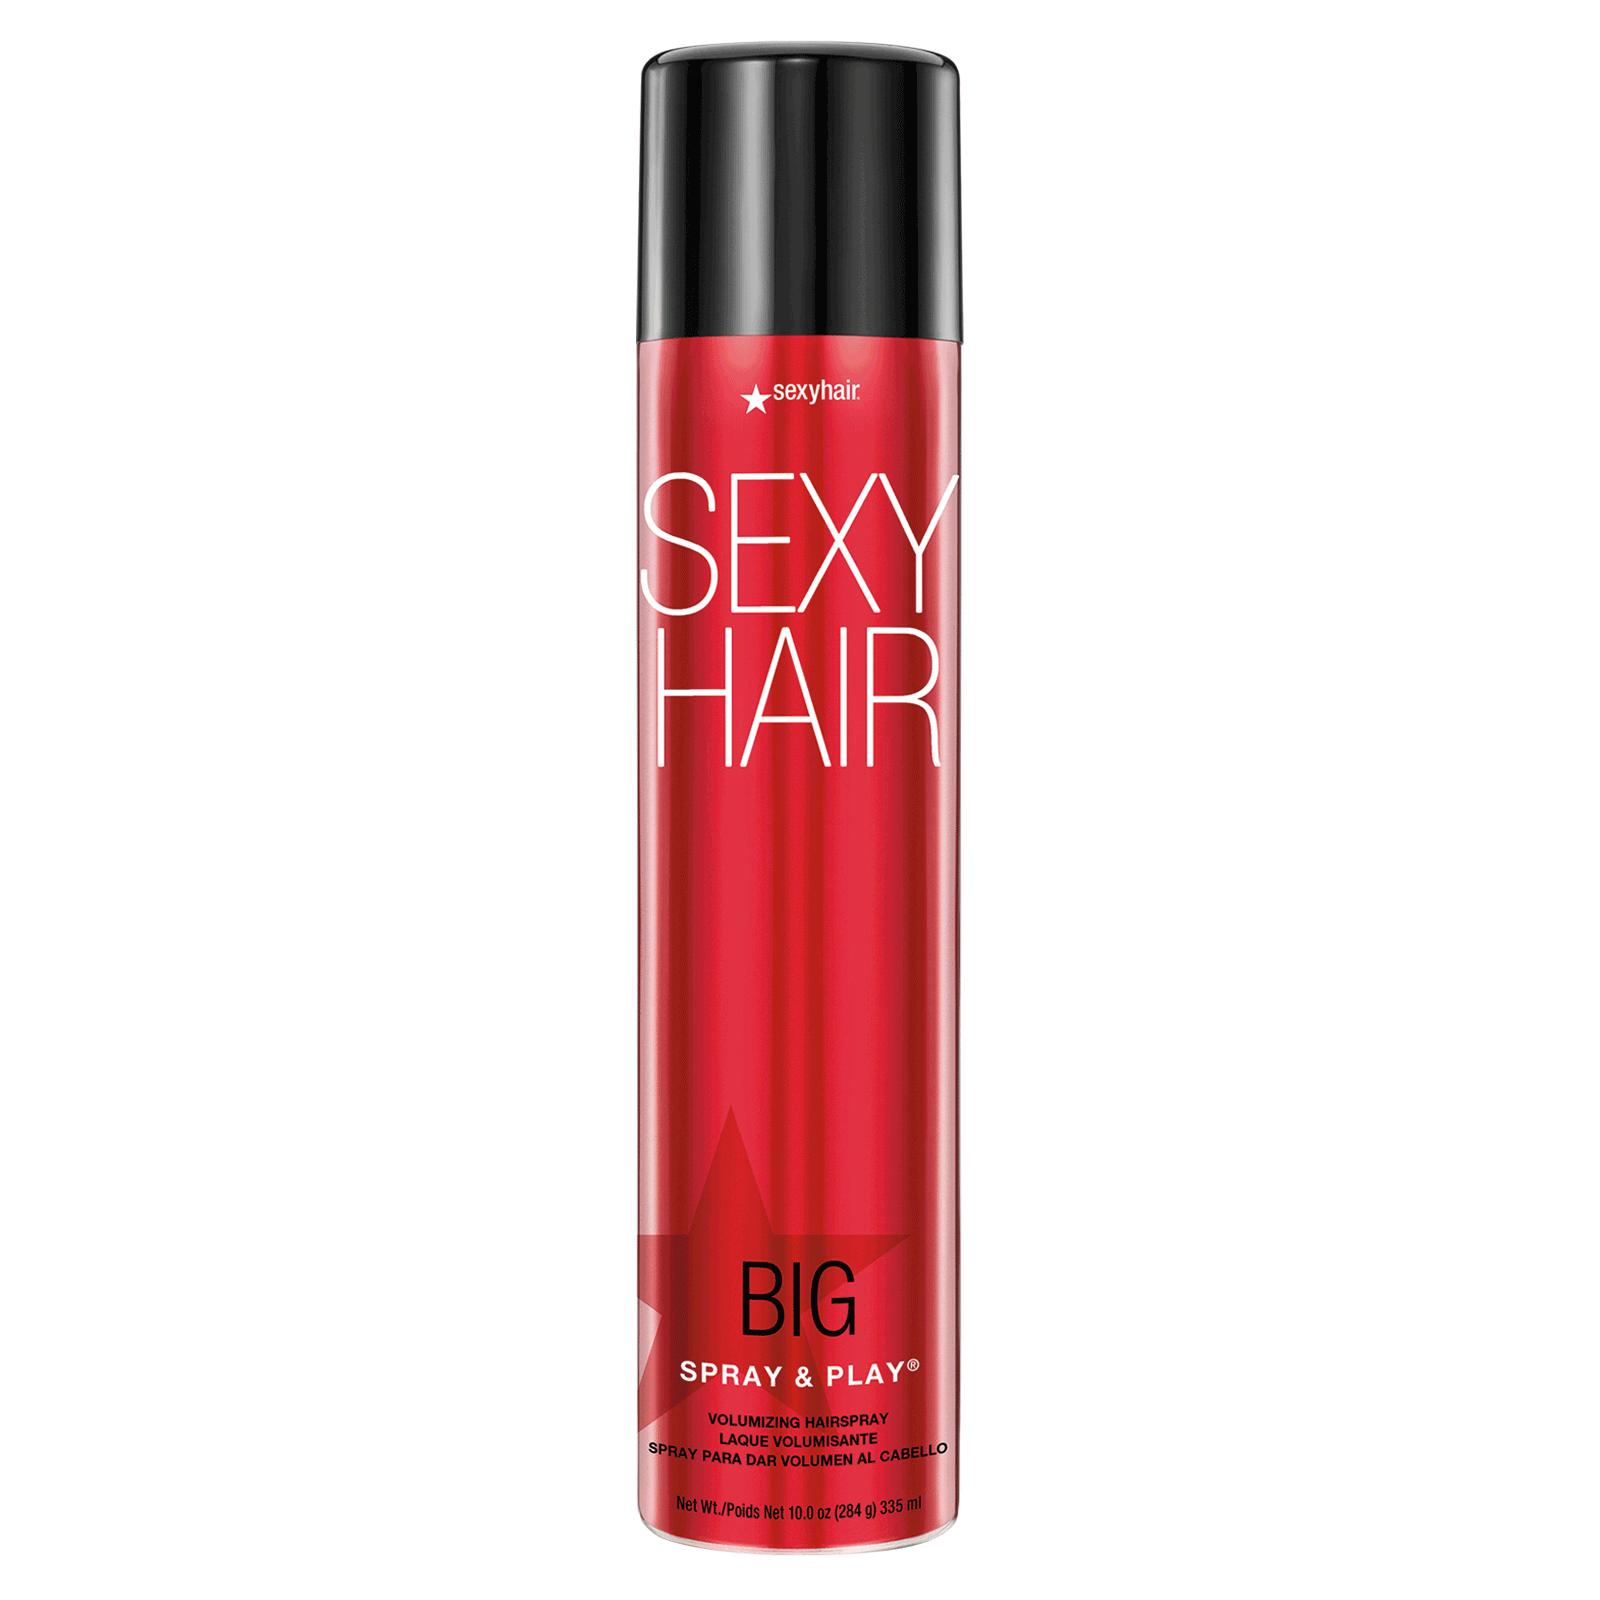 Big sexy hair spray play root pump powder play lite sexy hair concepts cosmoprof - Alternative uses of hairspray ...